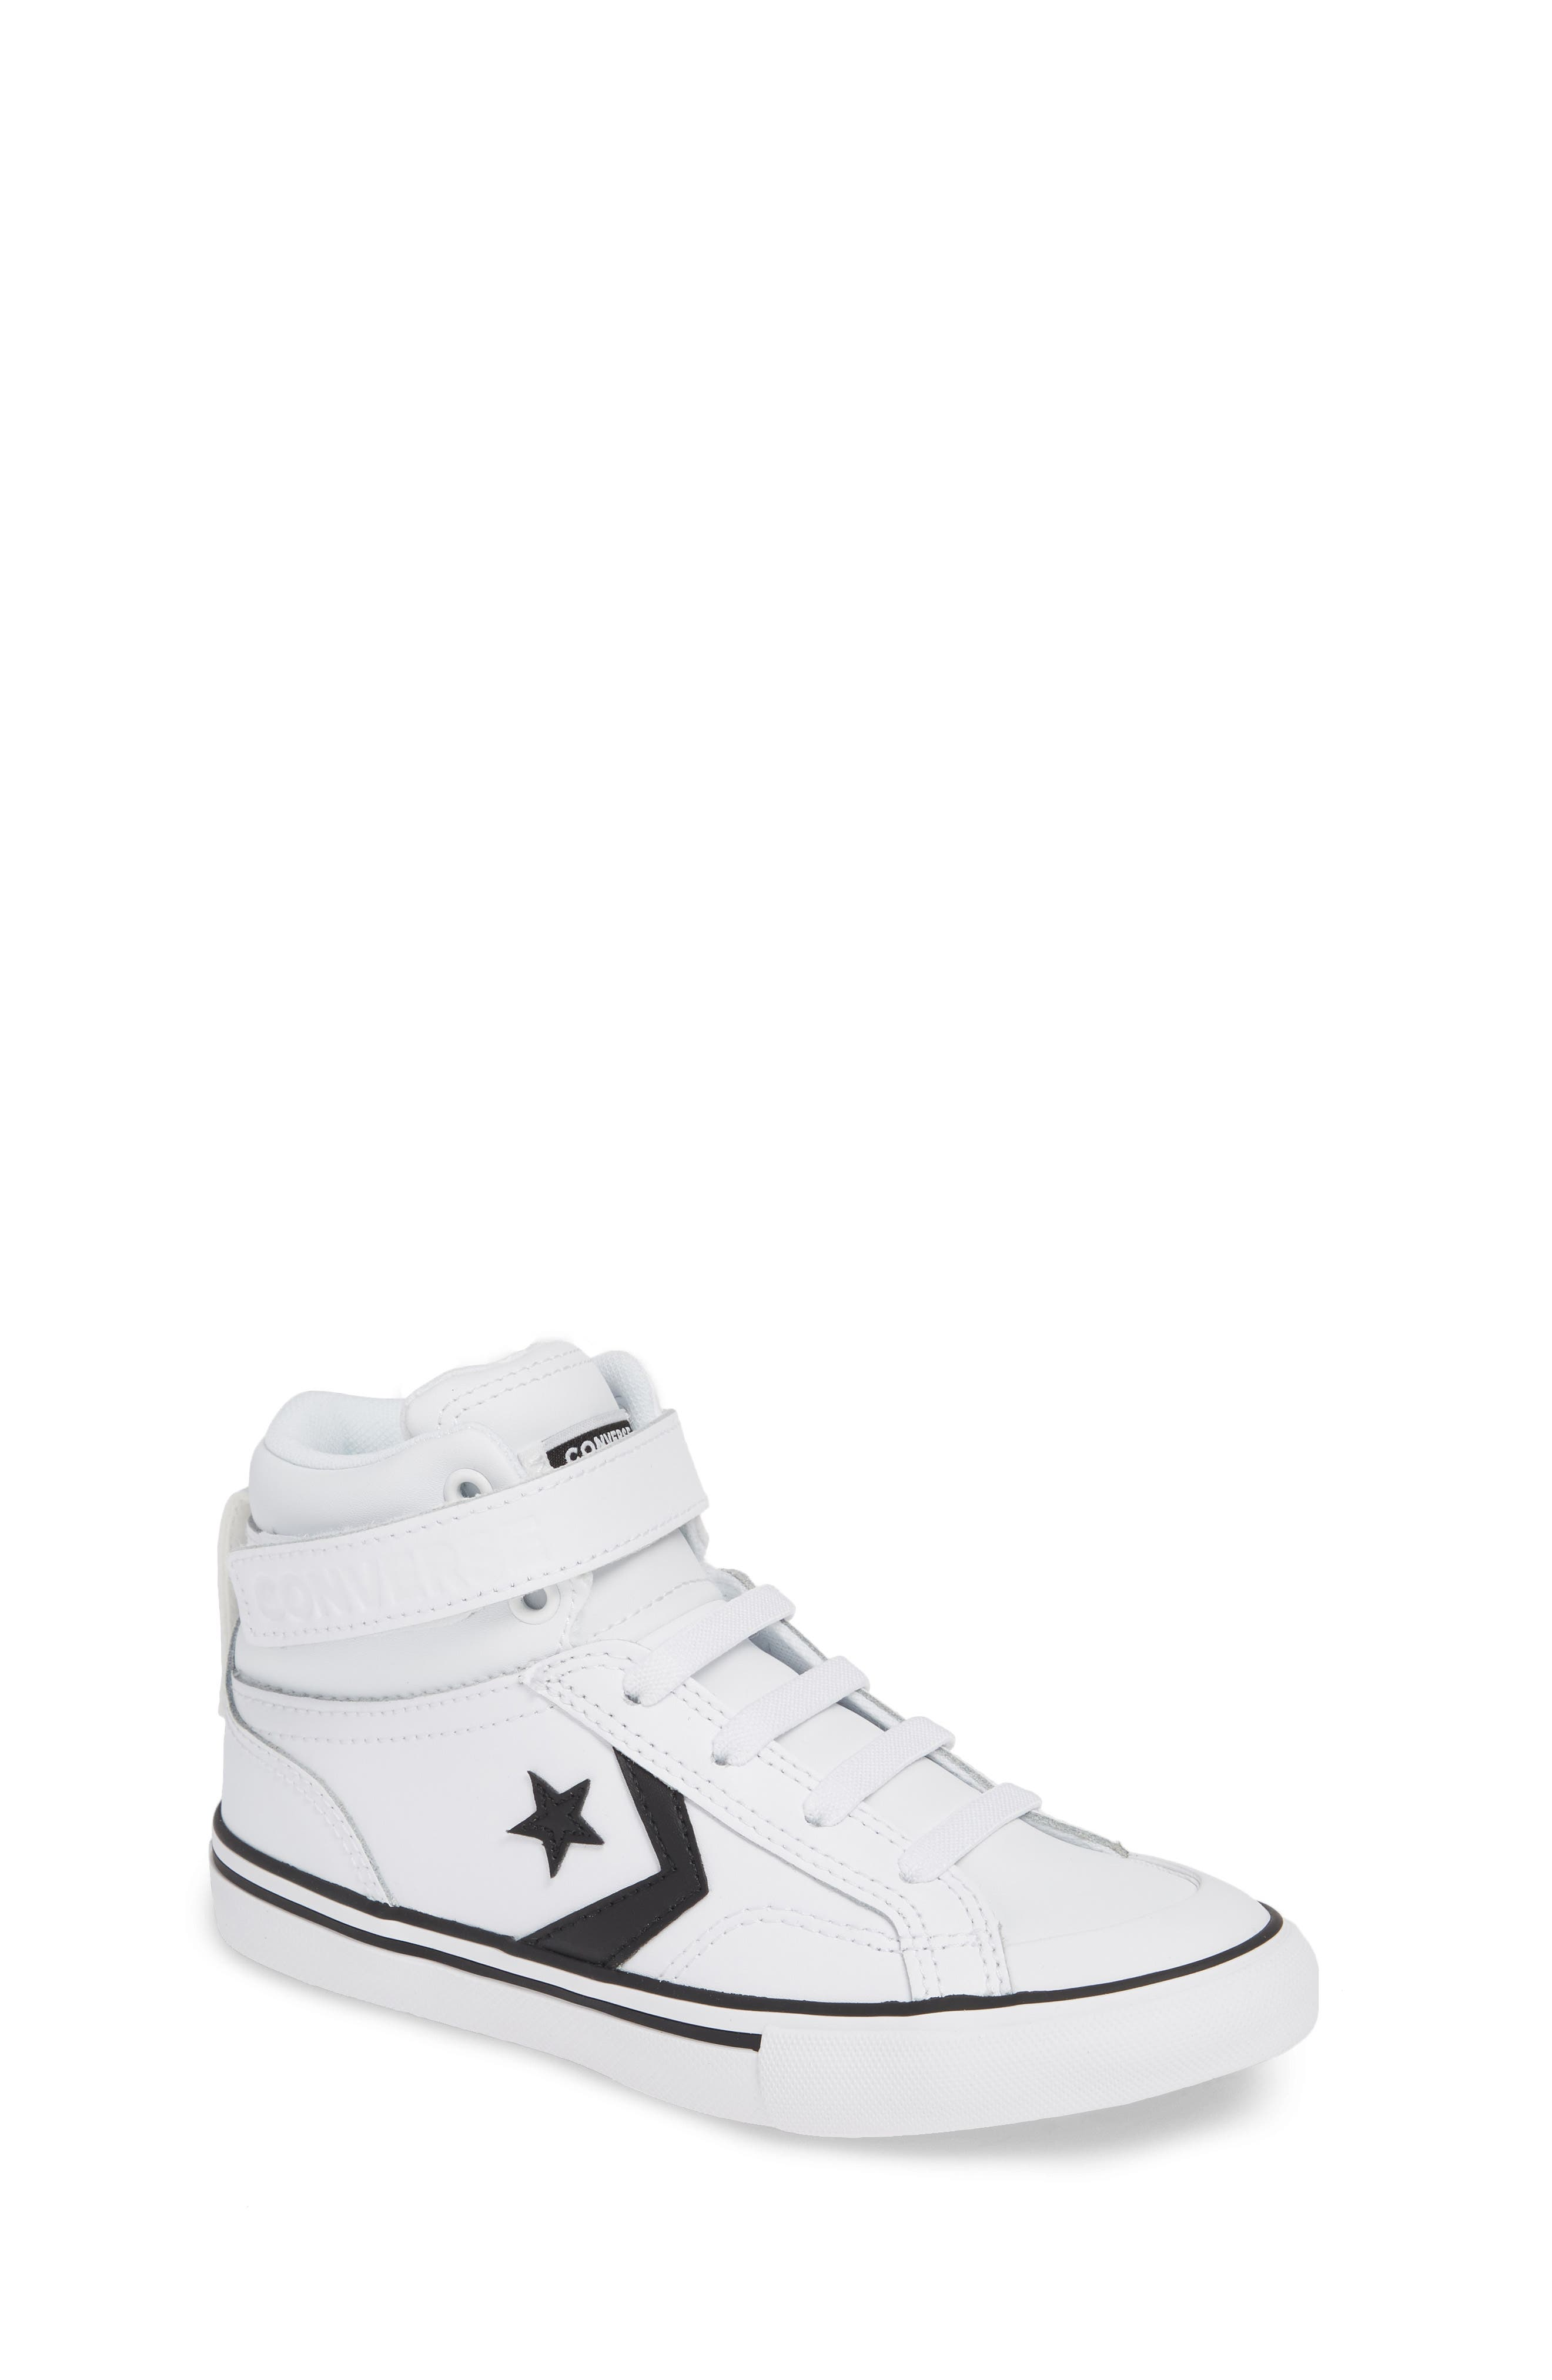 CONVERSE, Pro Blaze High Top Sneaker, Main thumbnail 1, color, WHITE/ BLACK/ WHITE